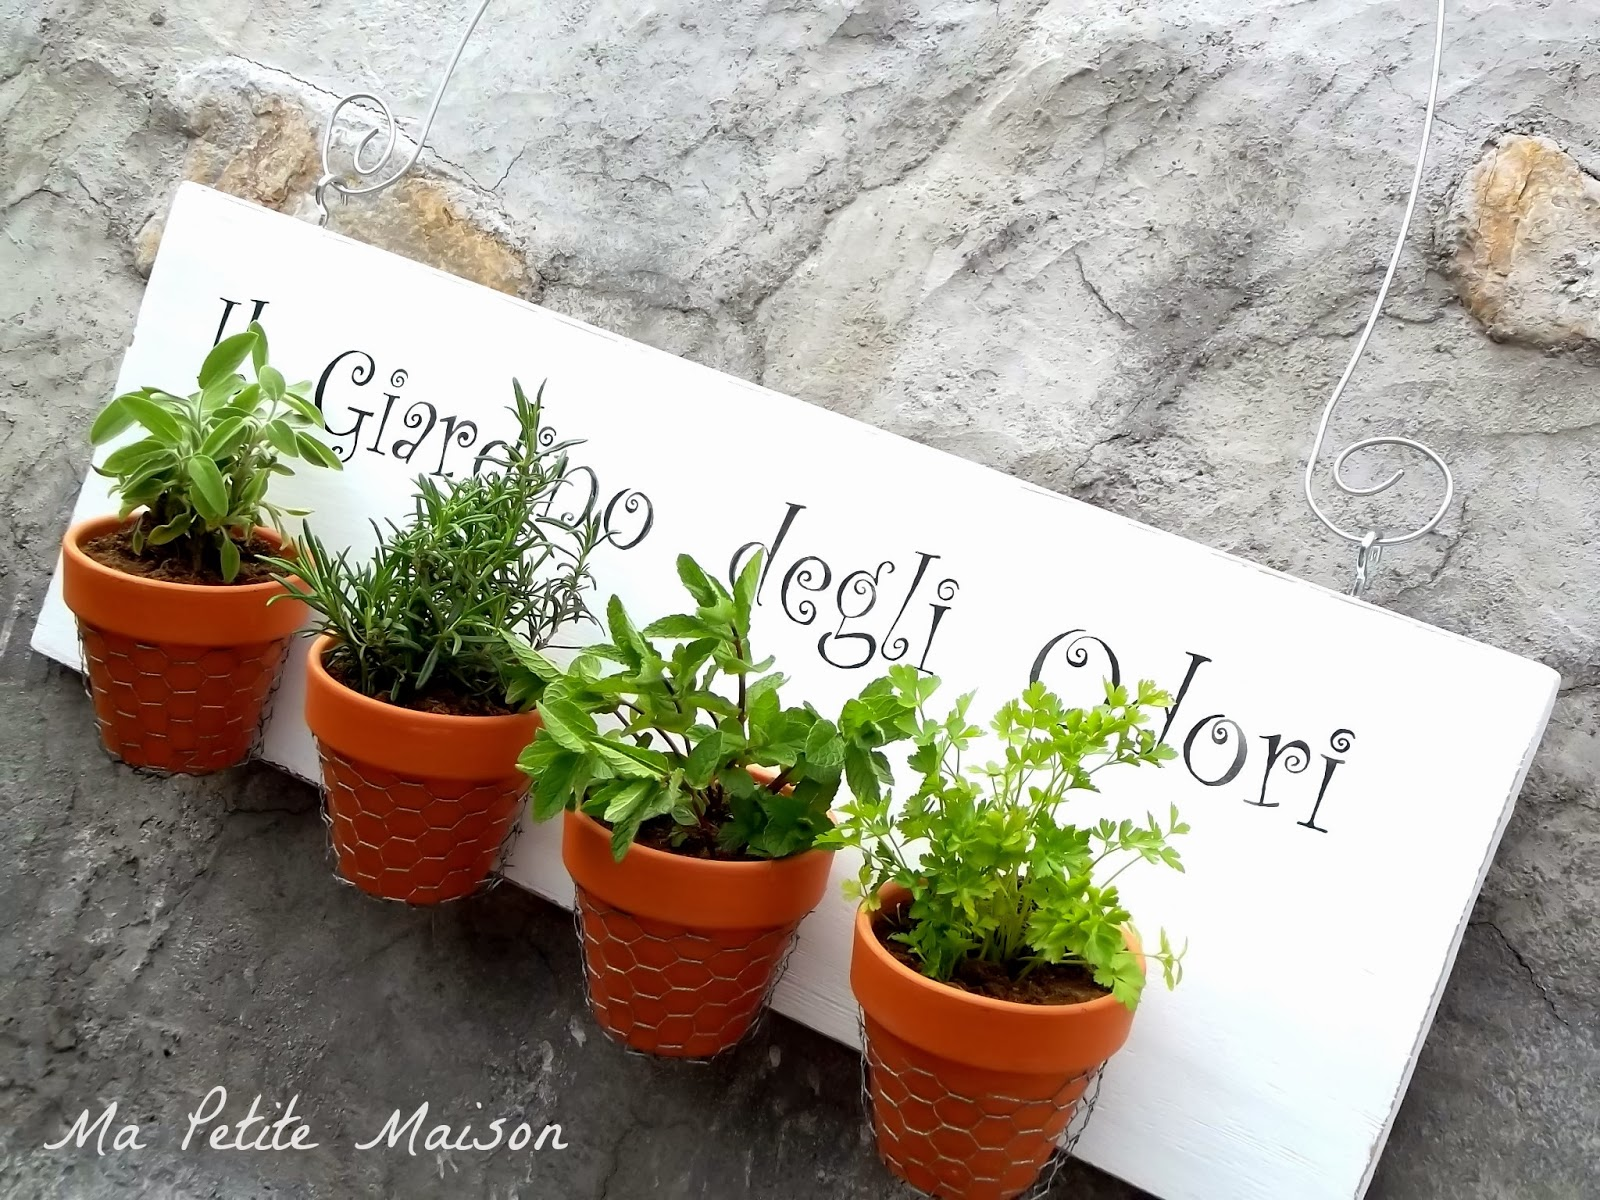 Il giardino degli odori ma petite maison - Ma petite maison com ...